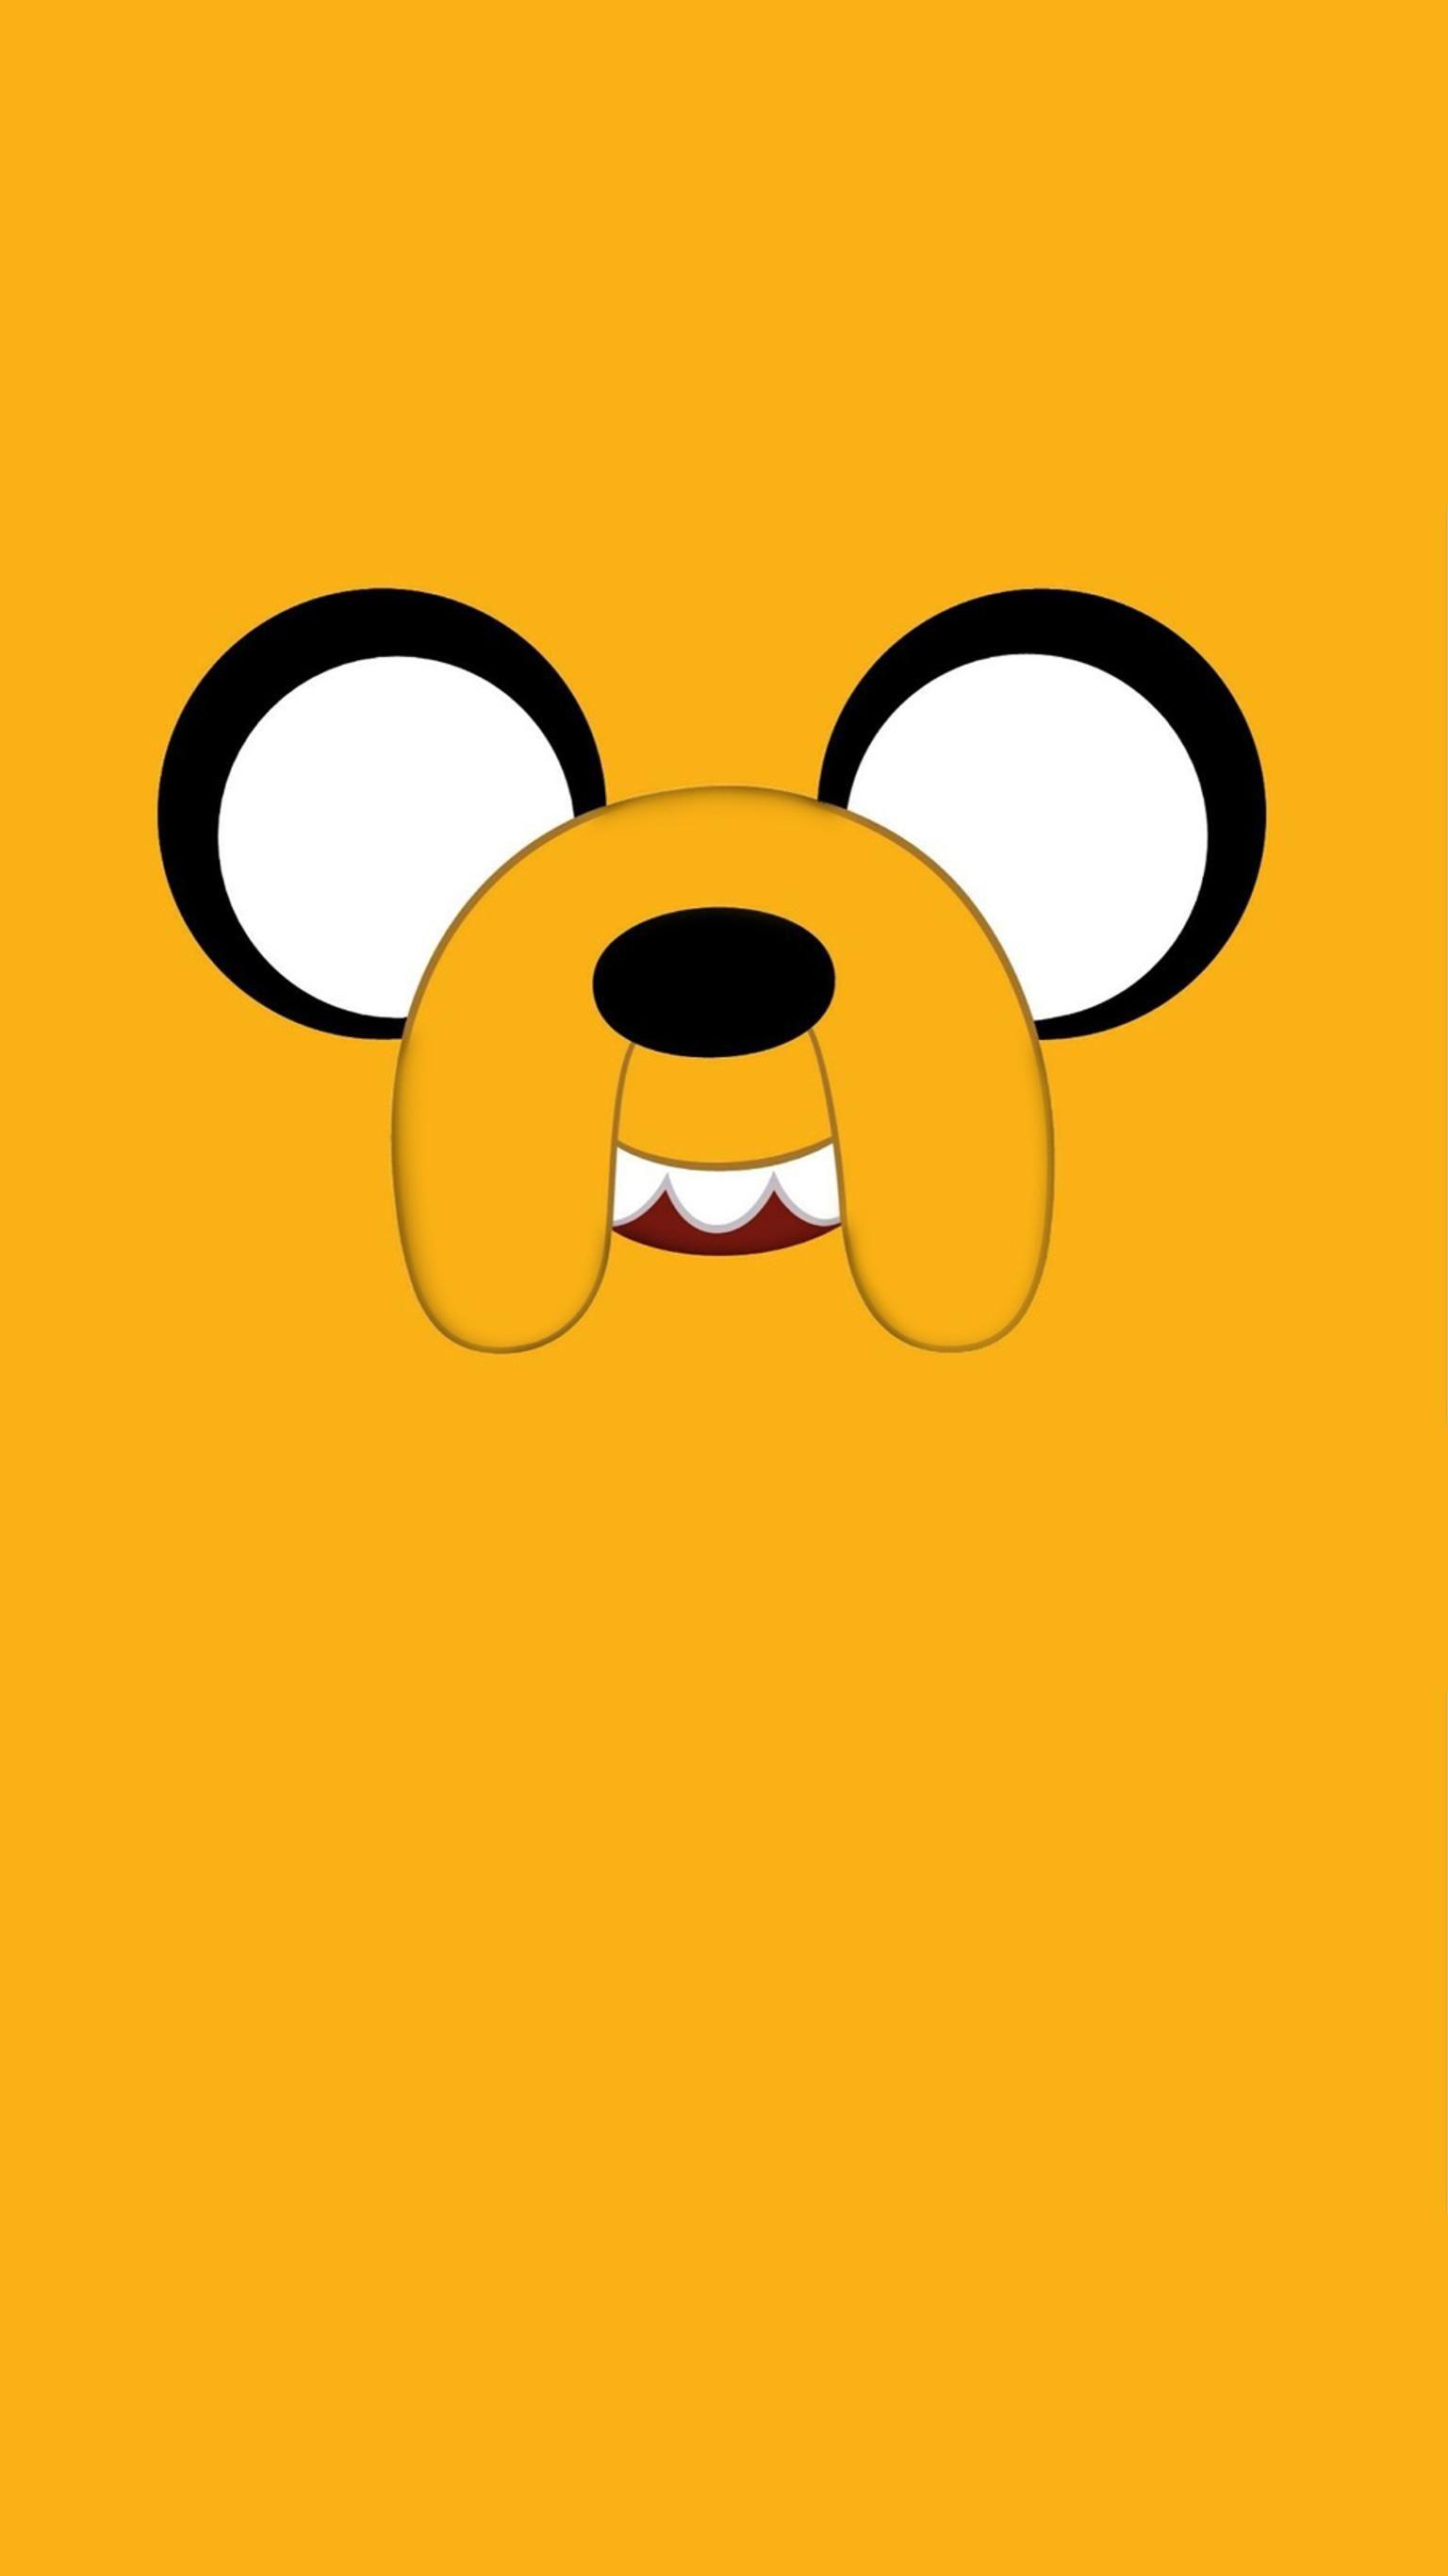 Adventure Time Phone Wallpaper Moviemania Adventure Time Wallpaper Adventure Time Fall Phone Wallpaper Adventure time cell phone wallpapers